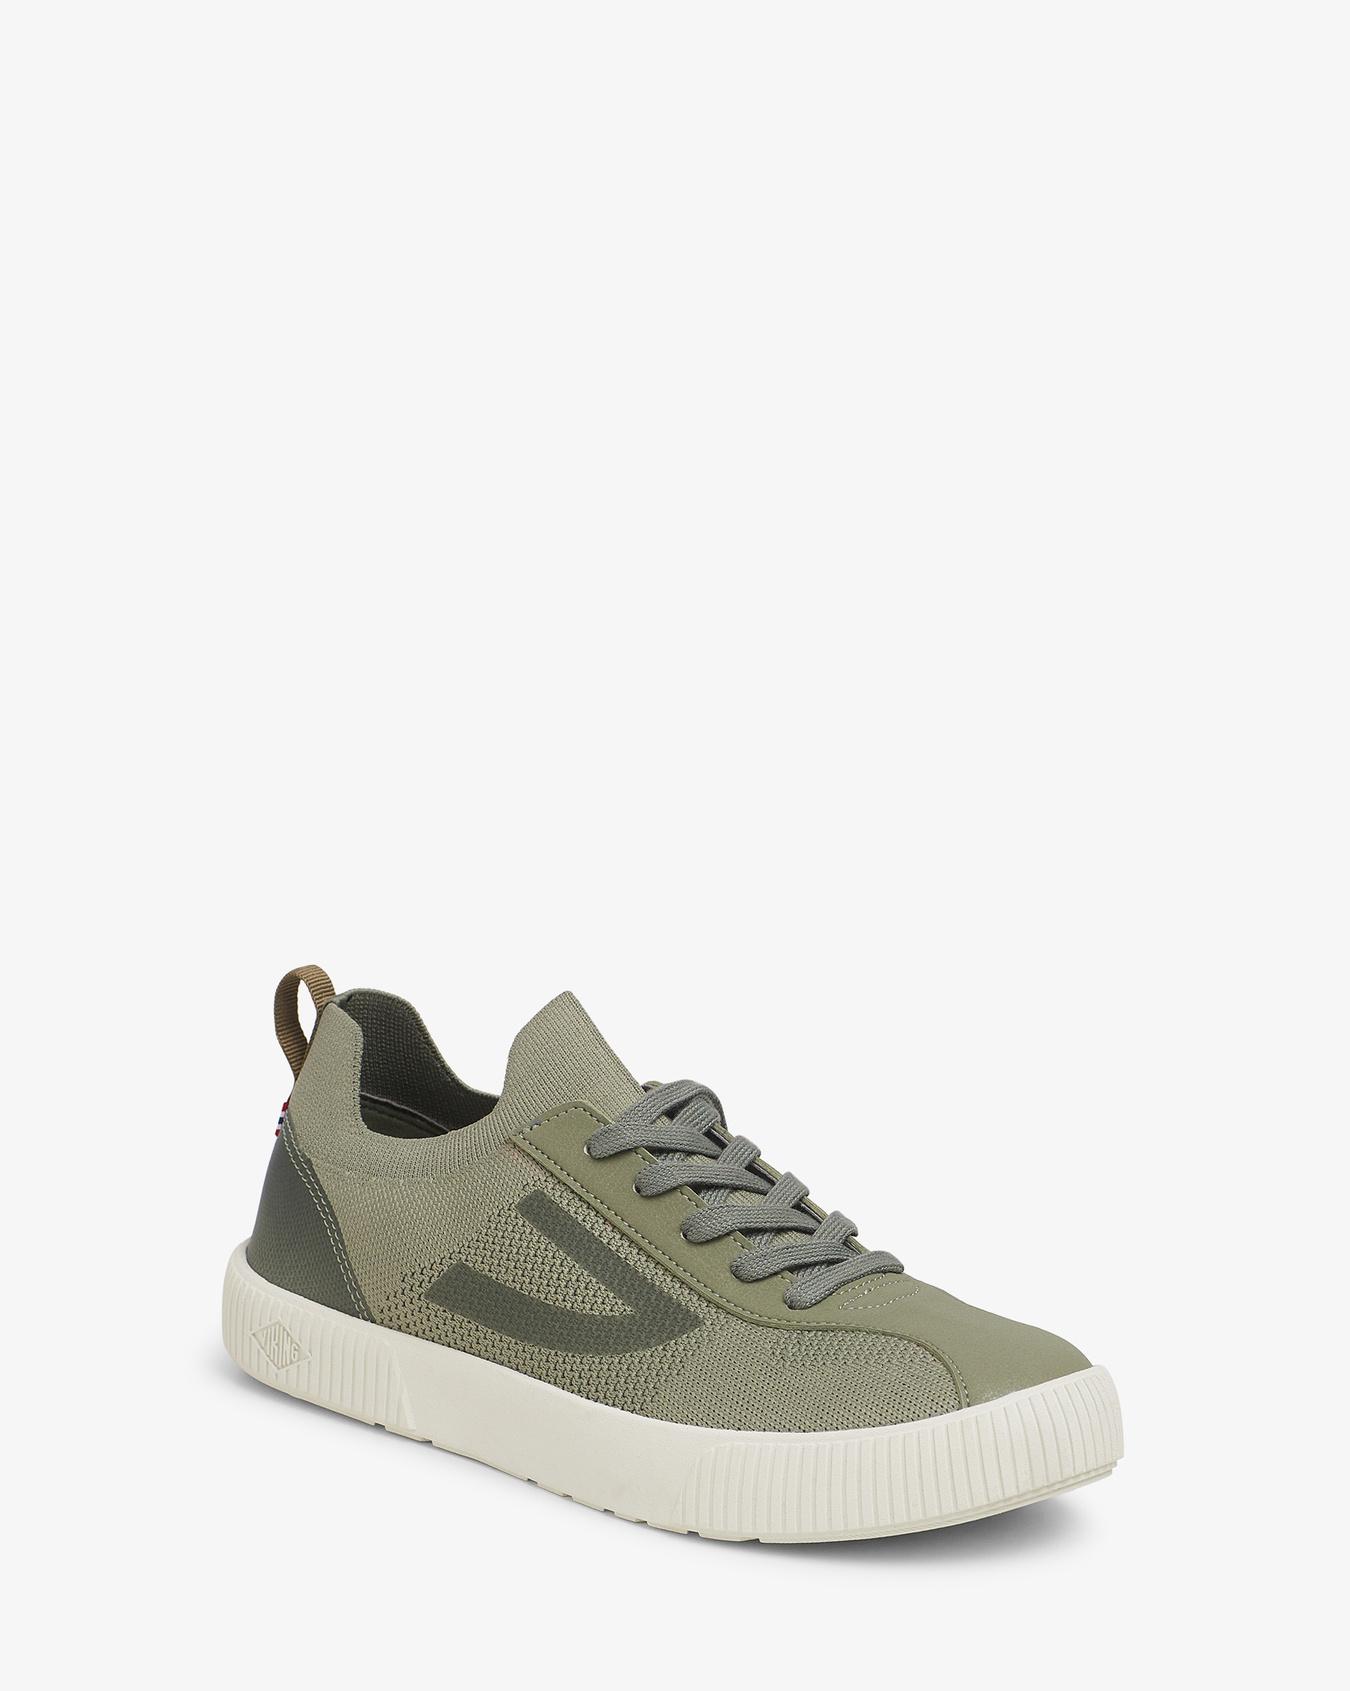 Retro Knitted Sneaker